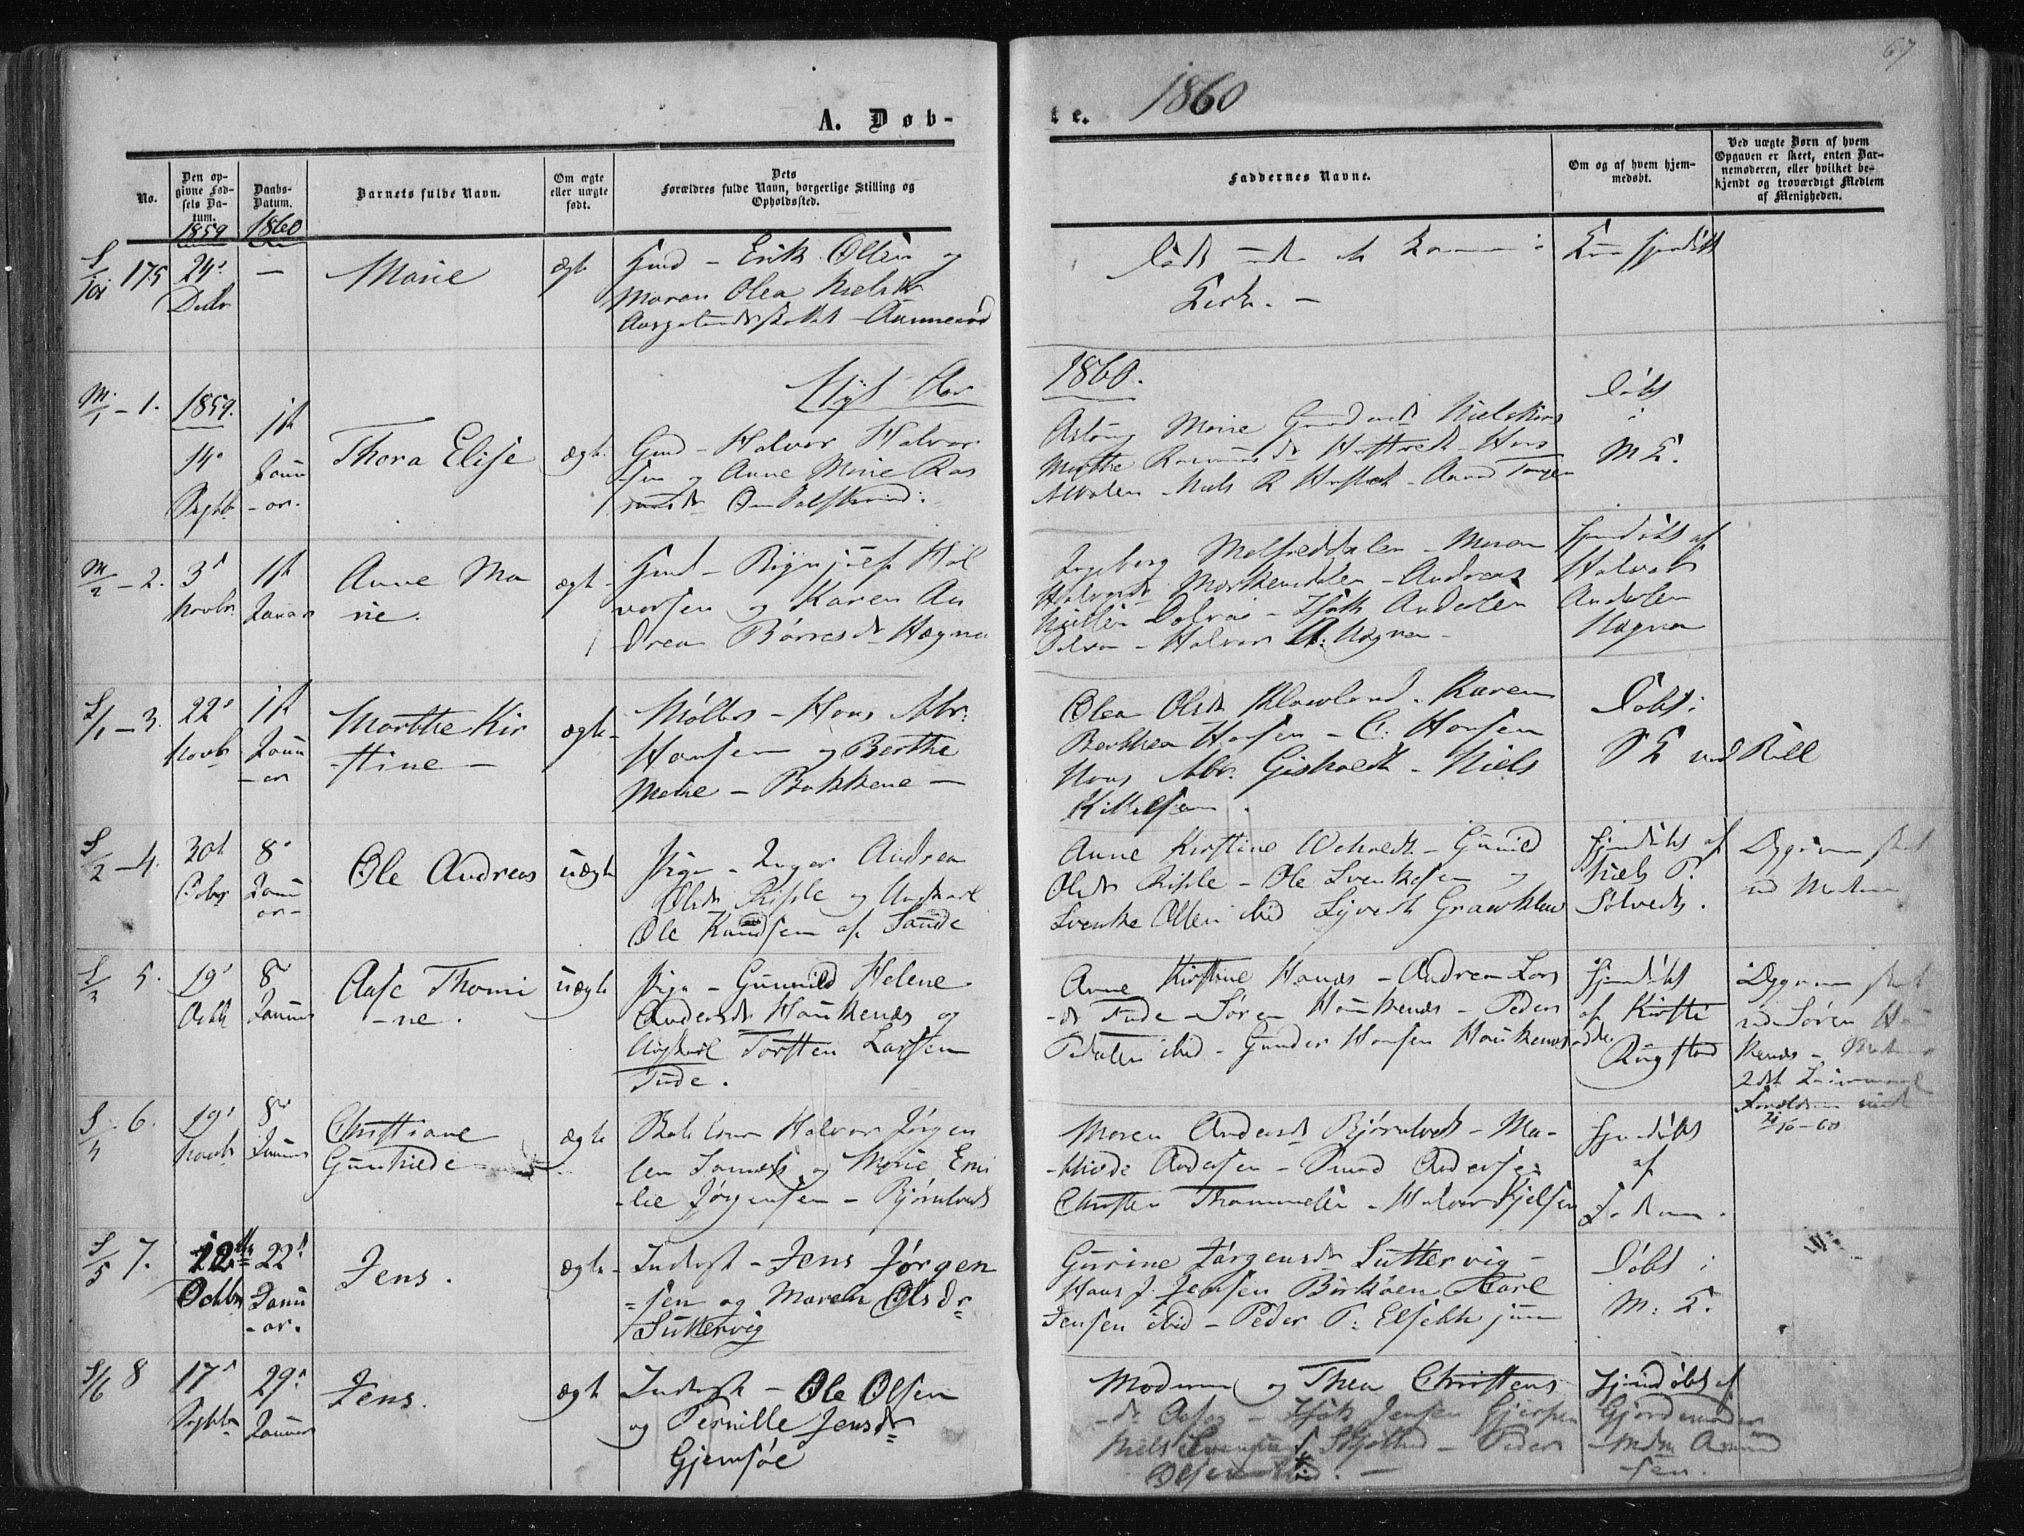 SAKO, Solum kirkebøker, F/Fa/L0007: Ministerialbok nr. I 7, 1856-1864, s. 67